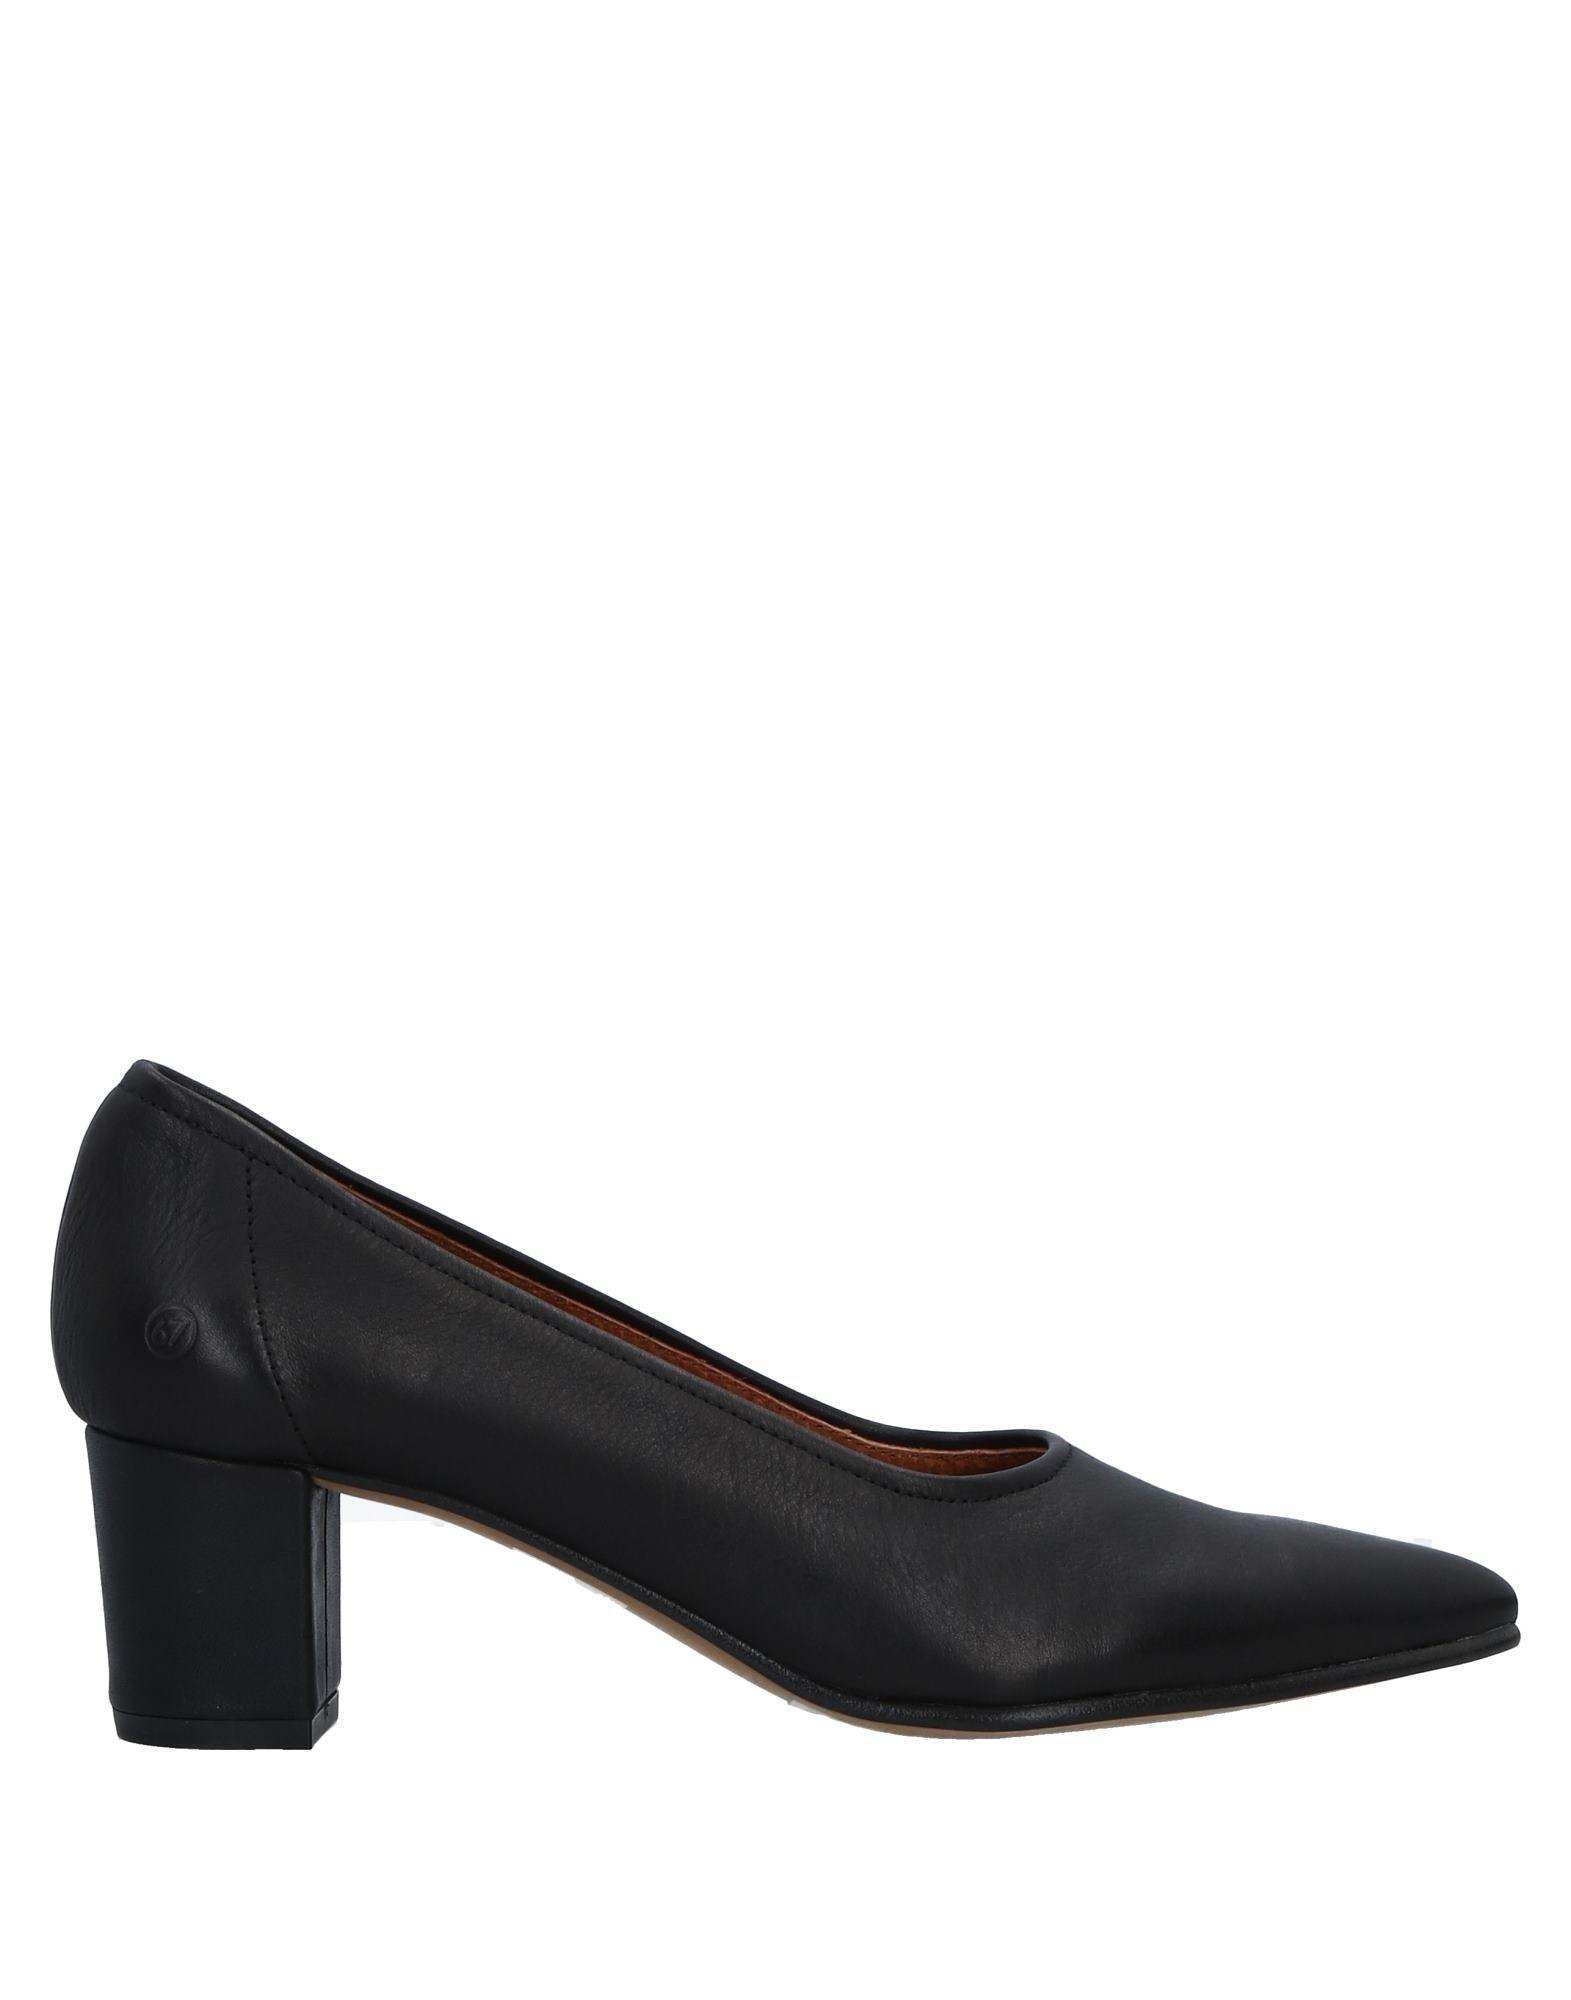 67 11542141AC Sixtyseven Pumps Damen  11542141AC 67 Gute Qualität beliebte Schuhe f4c833